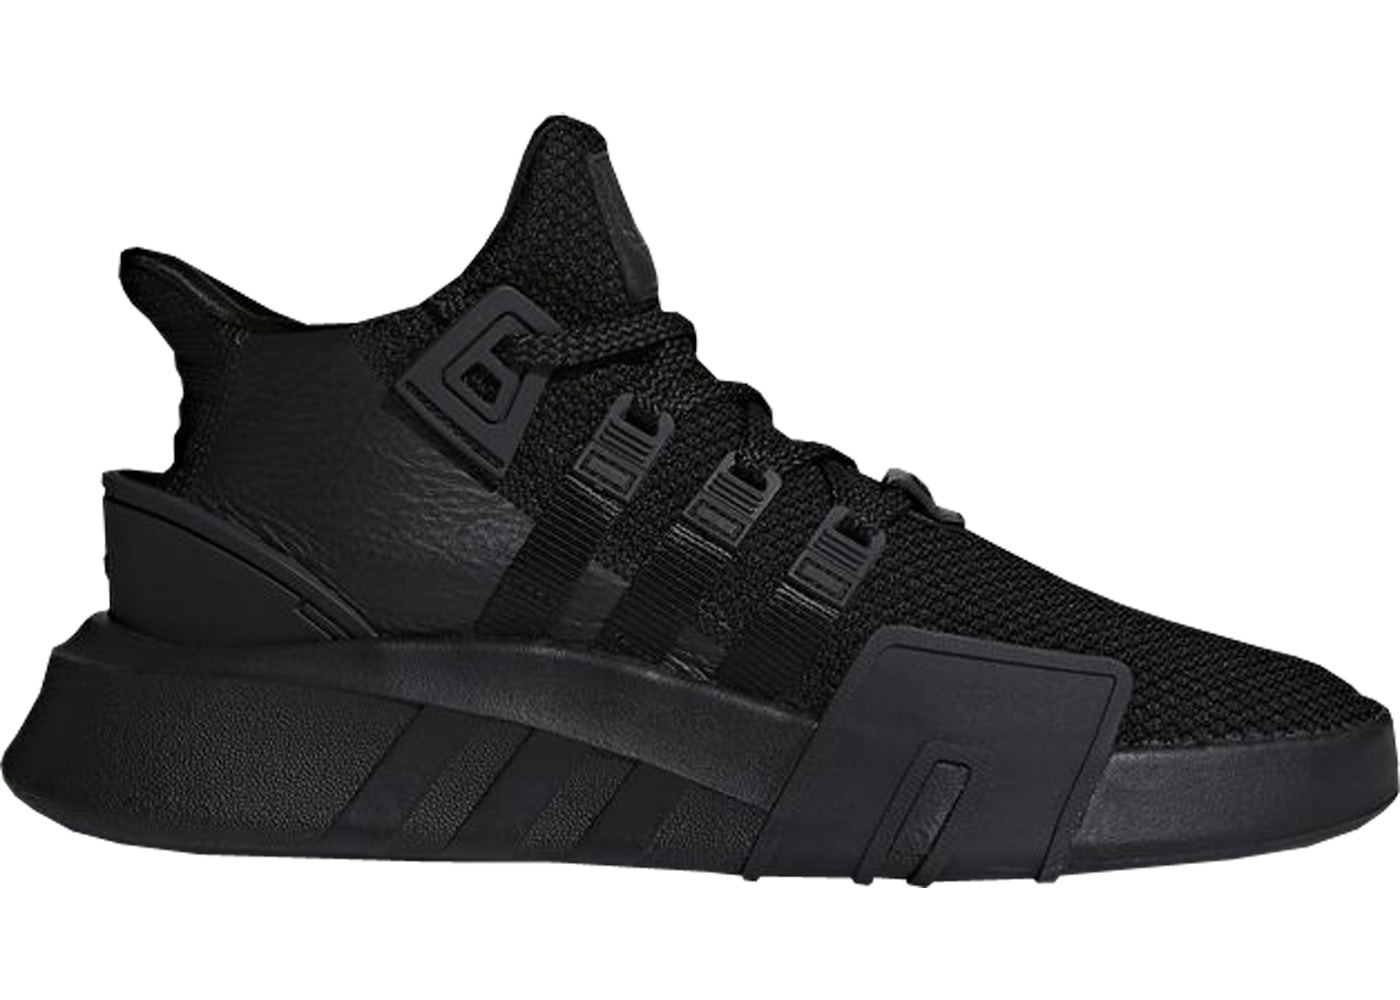 07f6cfdc0aa ... Worldwide Online Retailer List adidas EQT Basketball Adv Triple Black  ...